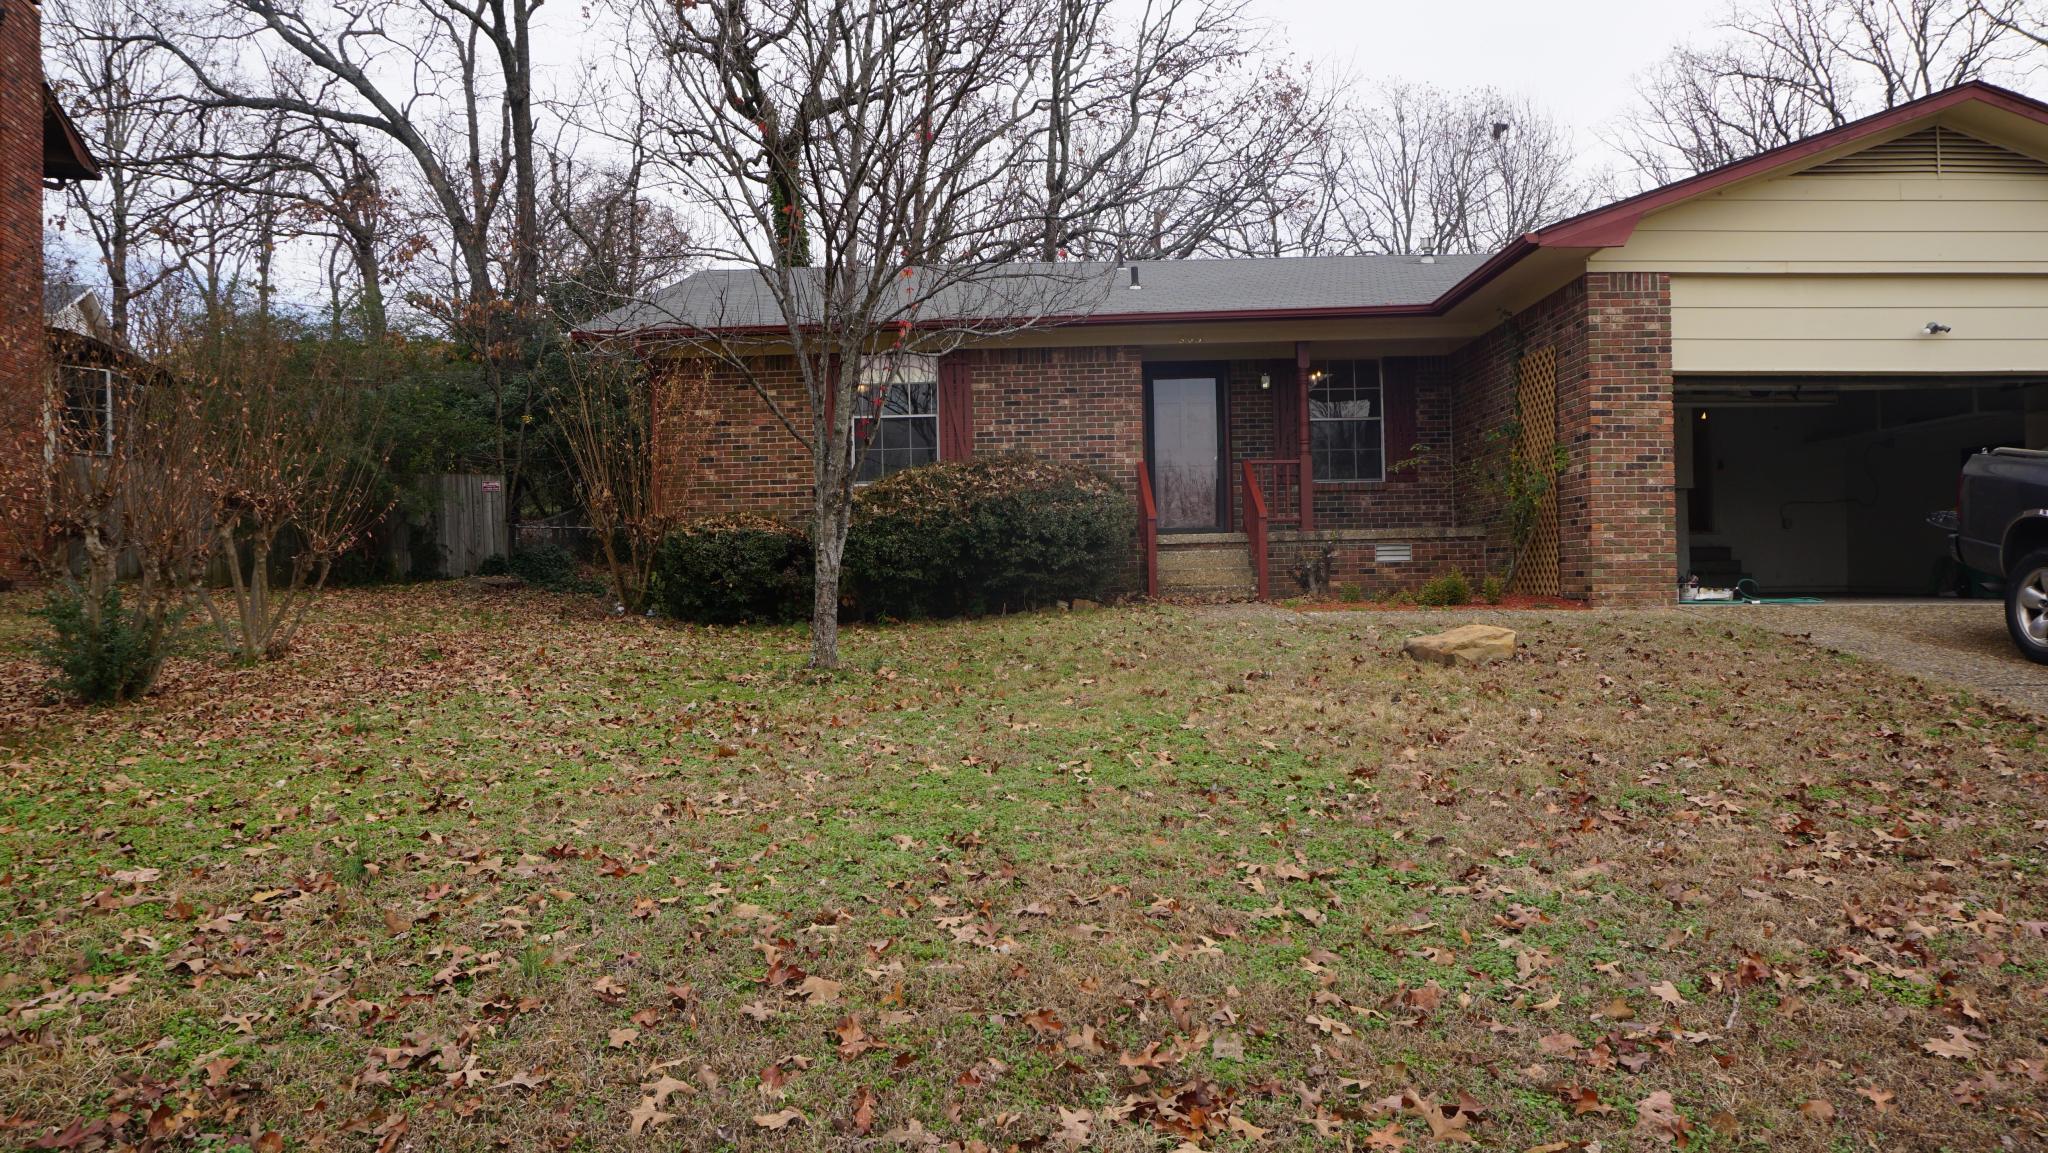 805 Emerald Gardens Dr, North Little Rock, AR 72118 For Rent | Trulia